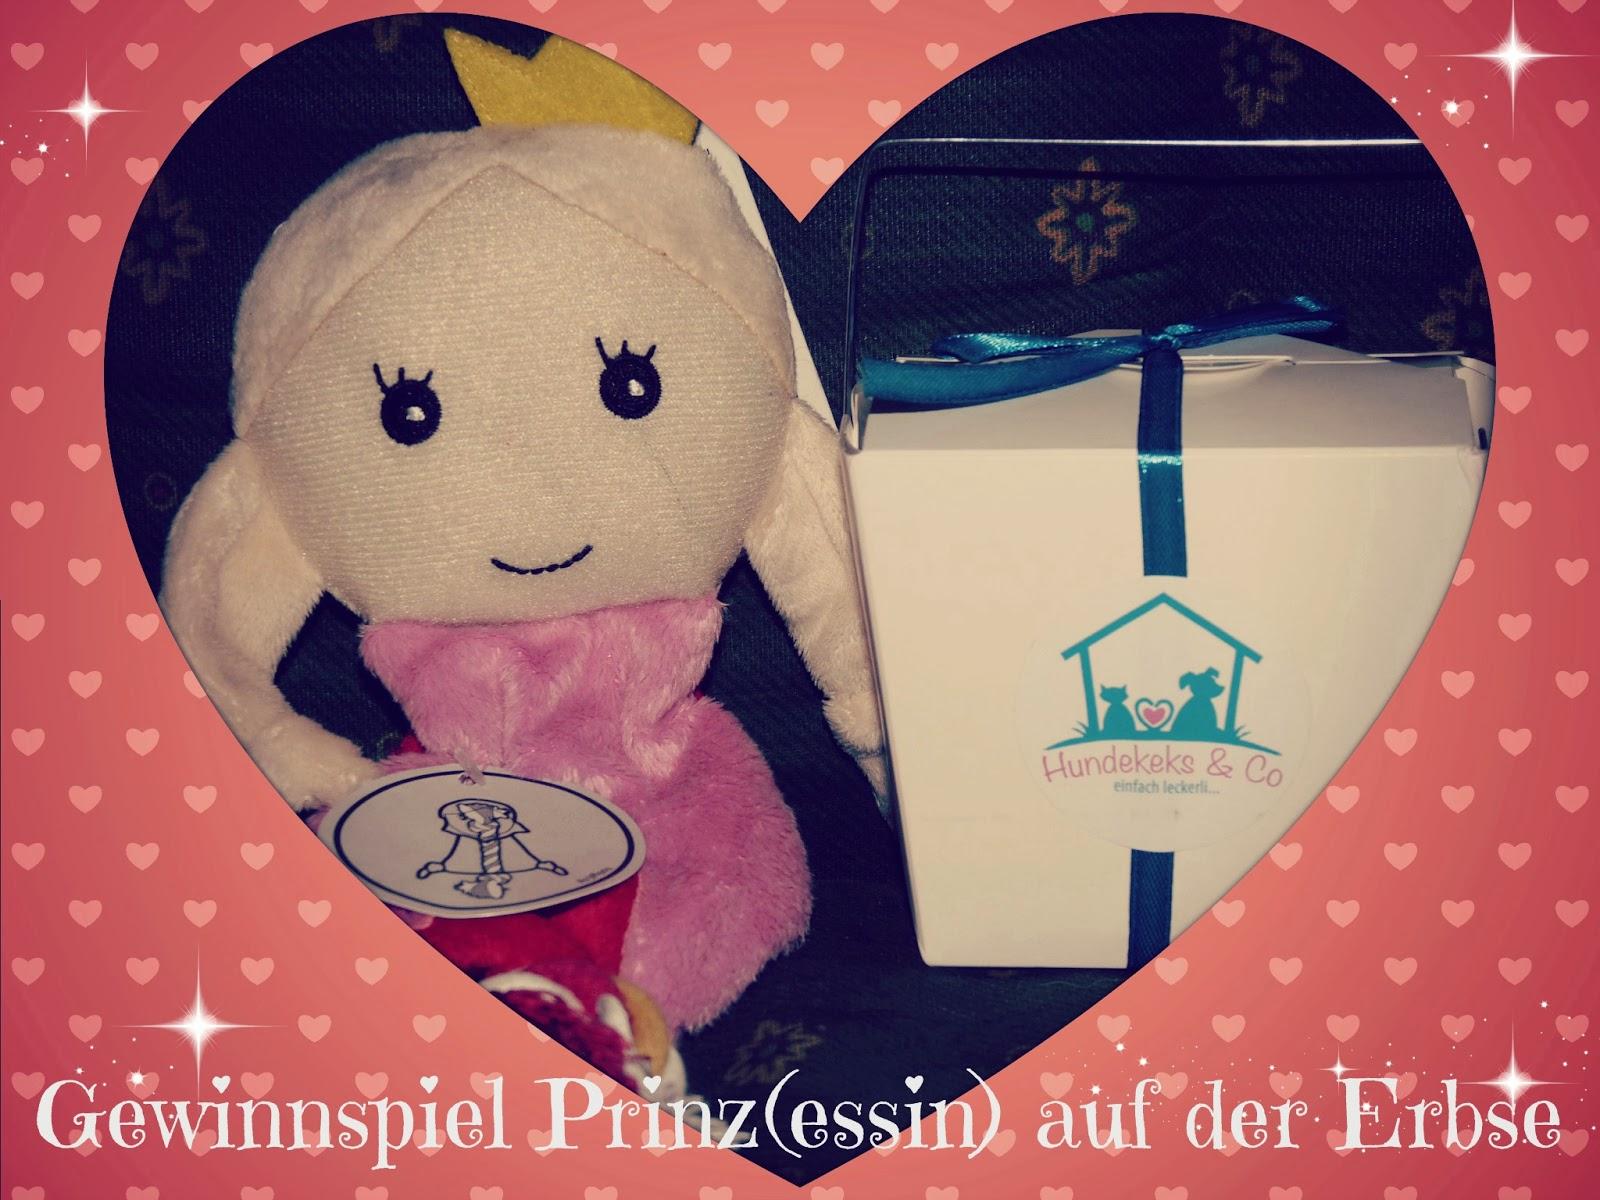 http://casperswelt.blogspot.de/2014/02/gewinnspiel-prinzessin-auf-der-erbse.html